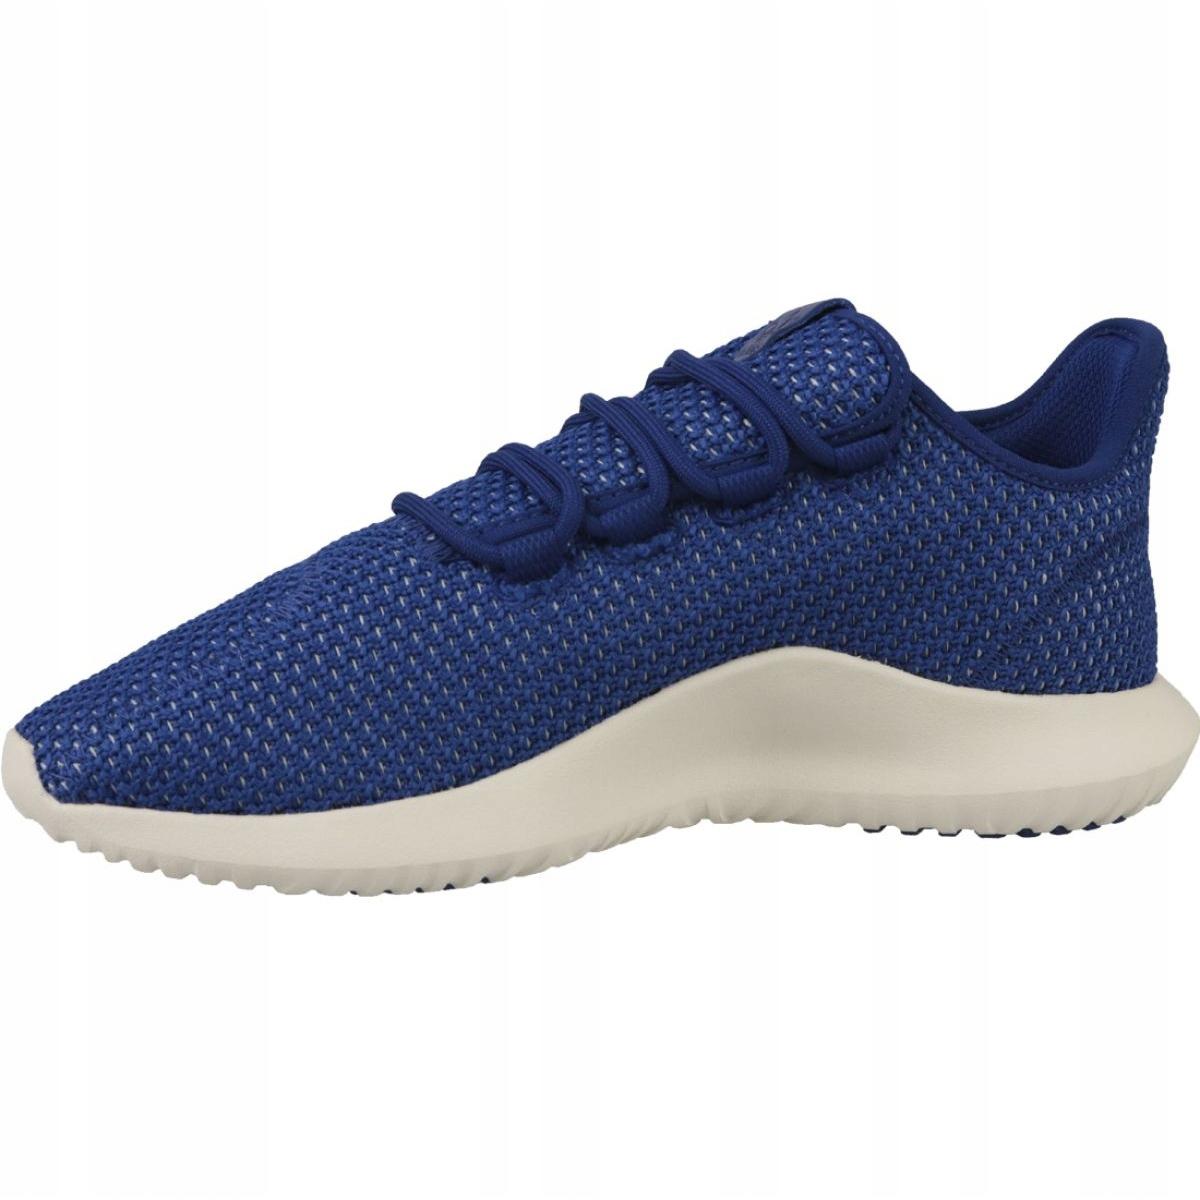 Adidas Tubular Shadow Ck M B37593 shoes